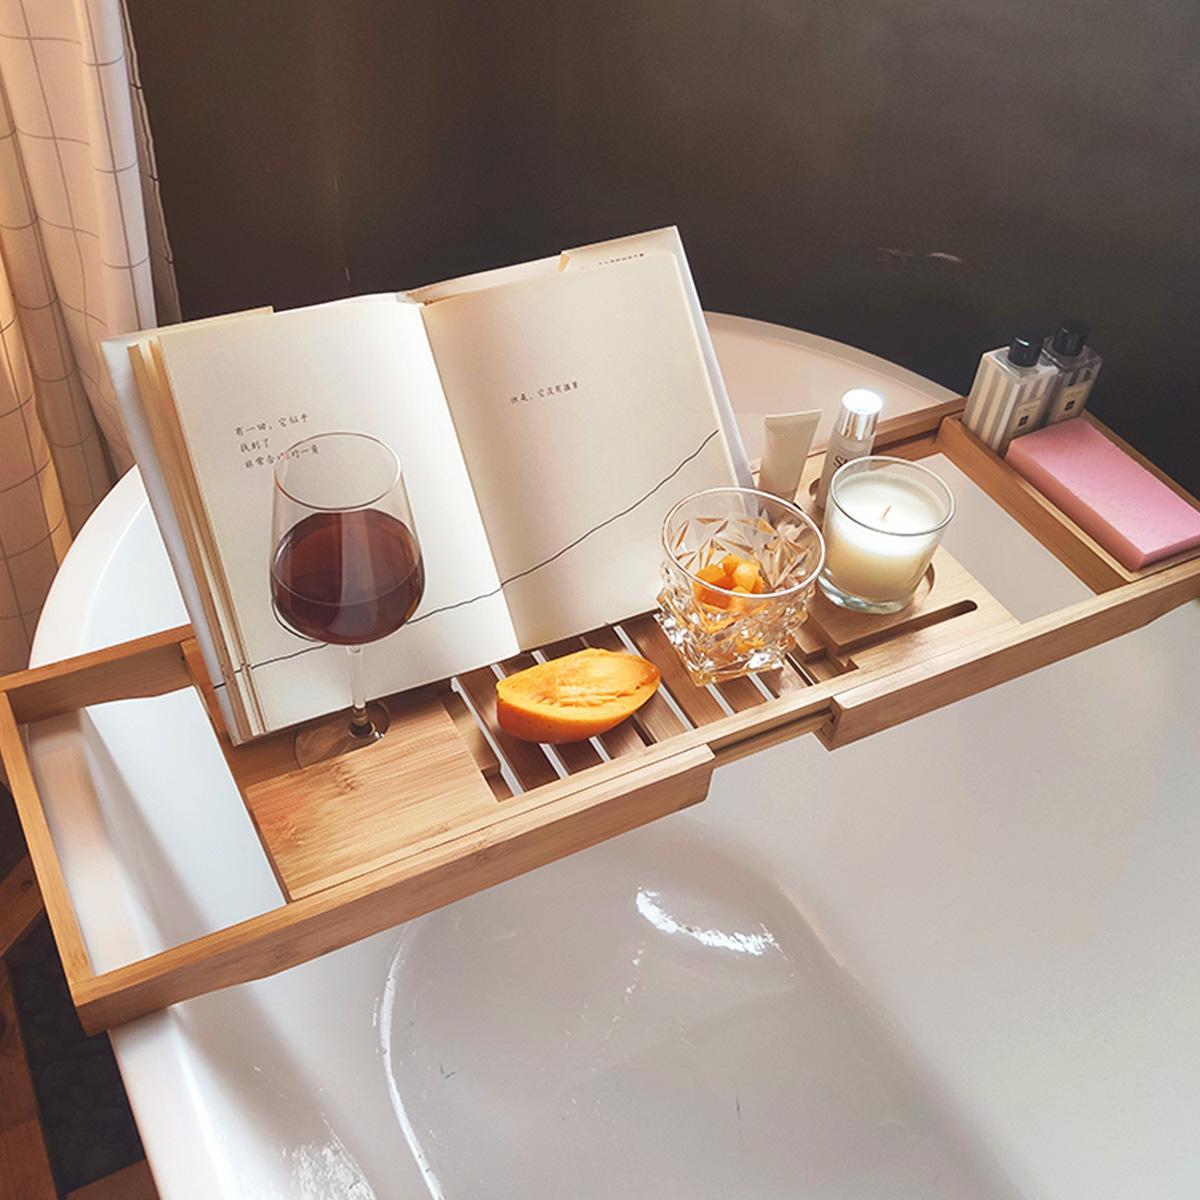 70 105cm Extendable Bamboo Bath Caddy Adjustable Home Spa Wooden Bath Tray Matt Blatt